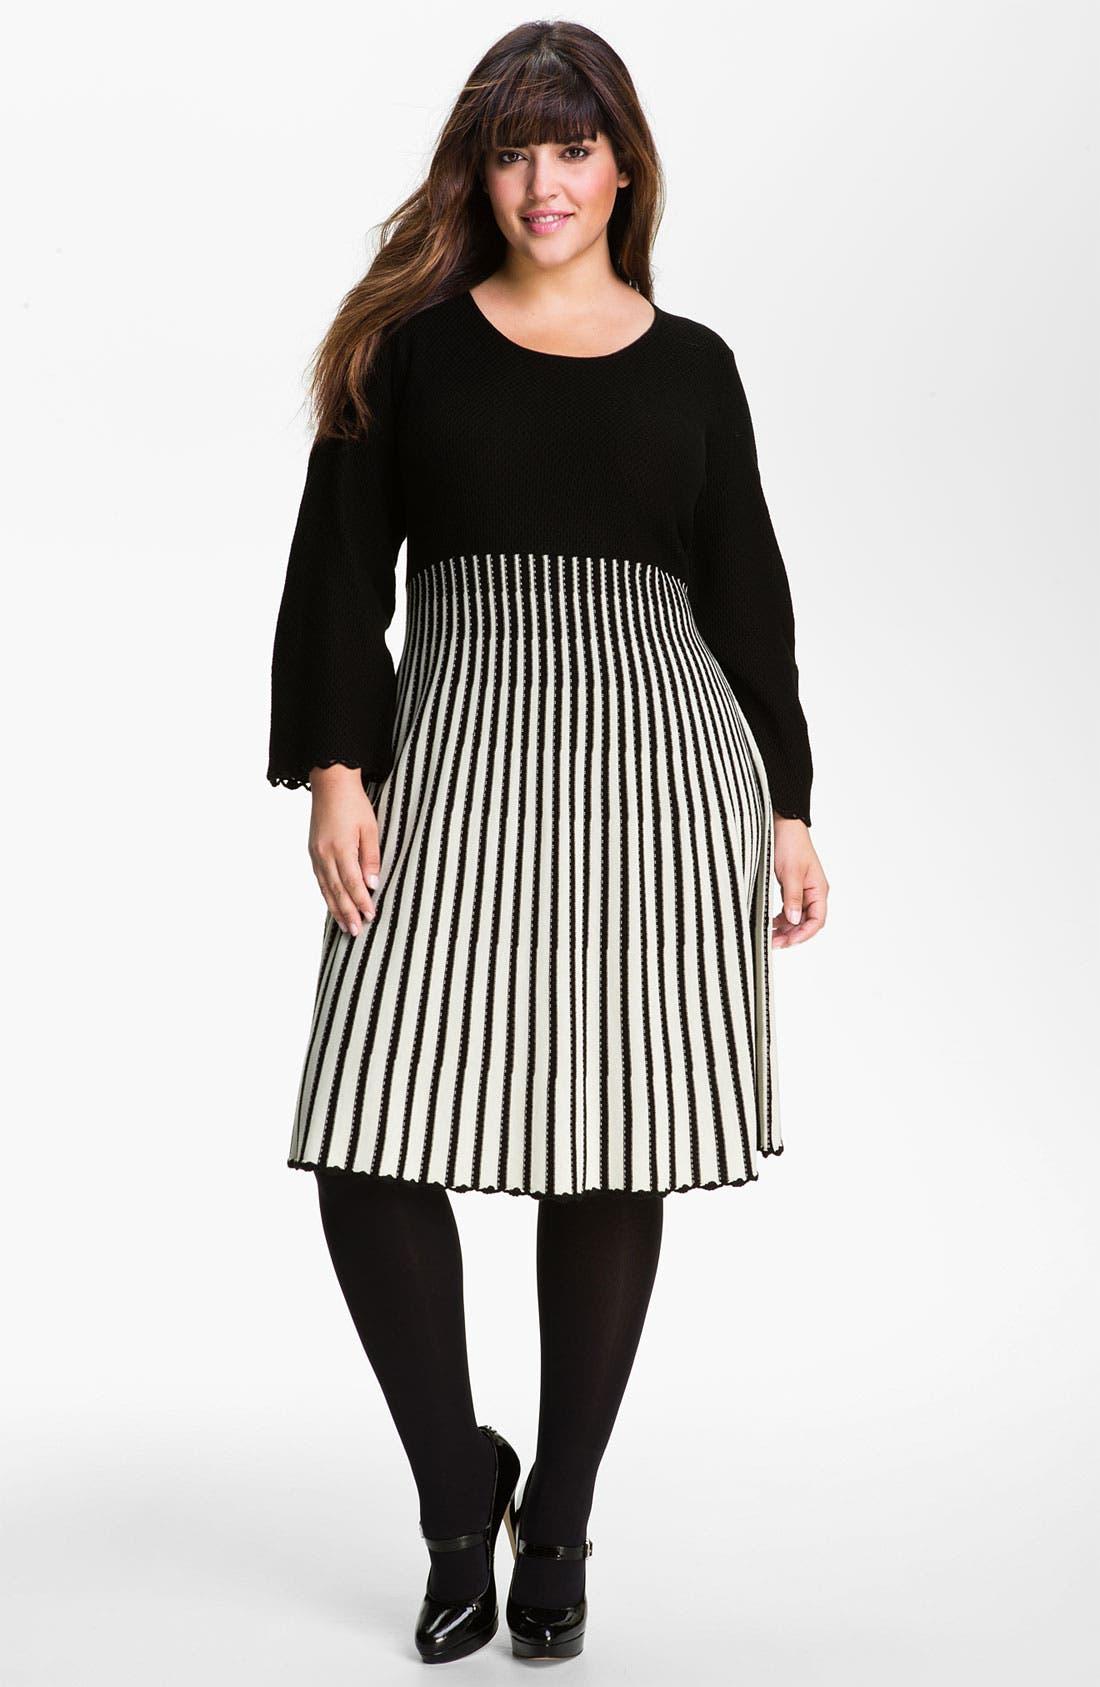 Alternate Image 1 Selected - Calvin Klein Sweater Dress (Plus)